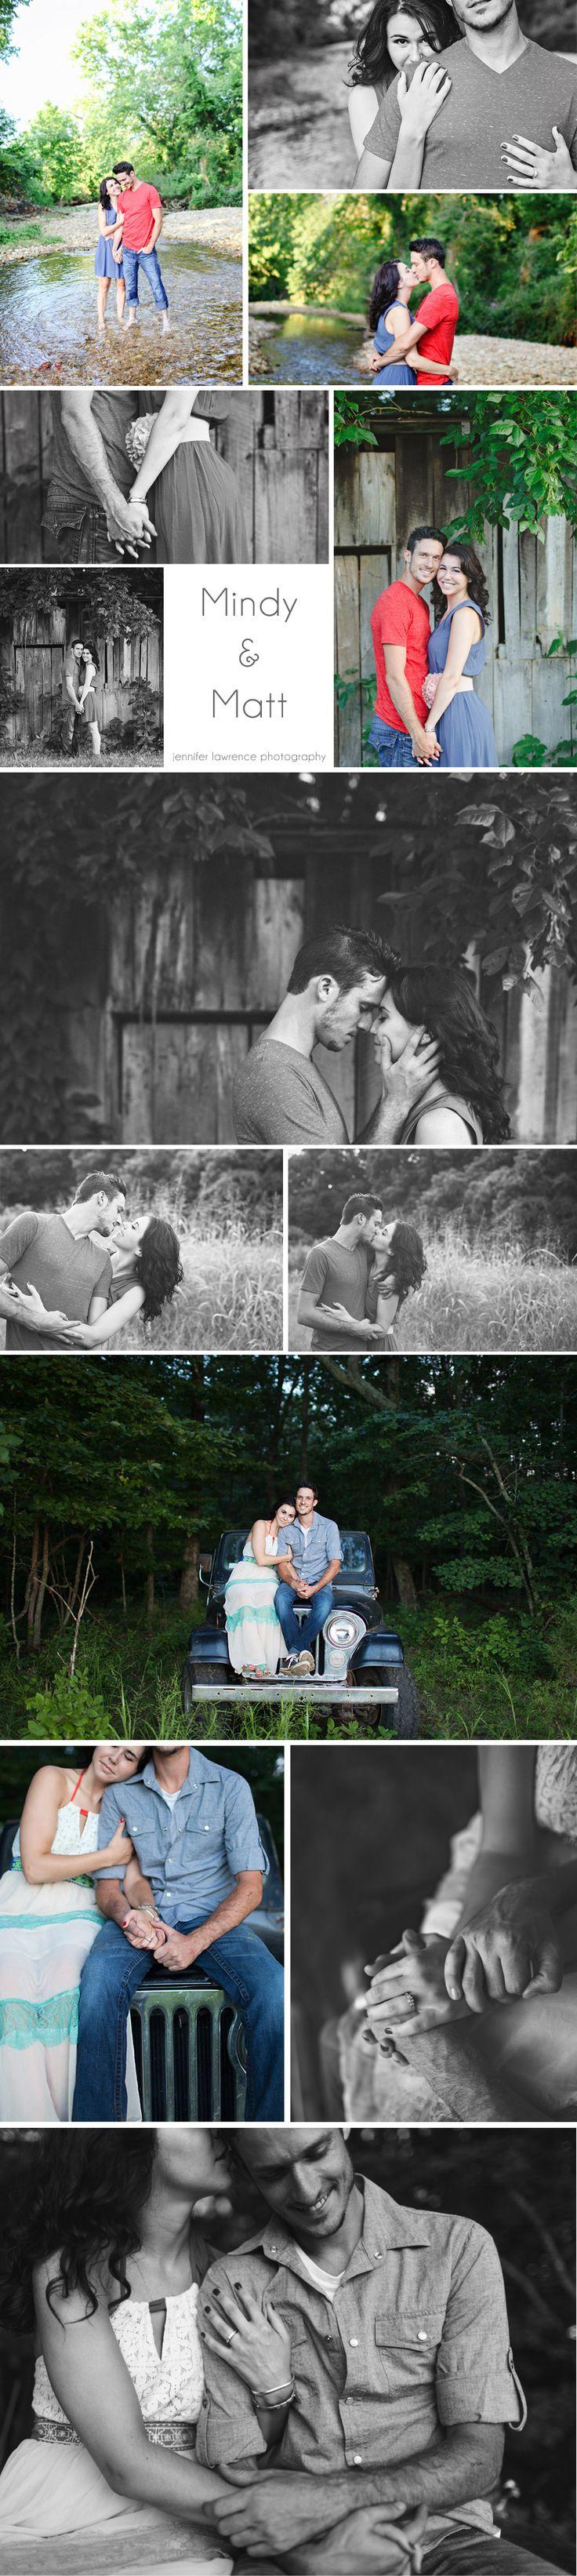 Engagement session, Jennifer Lawrence photography Nashville #engagement #lifestyle #engagementphotography